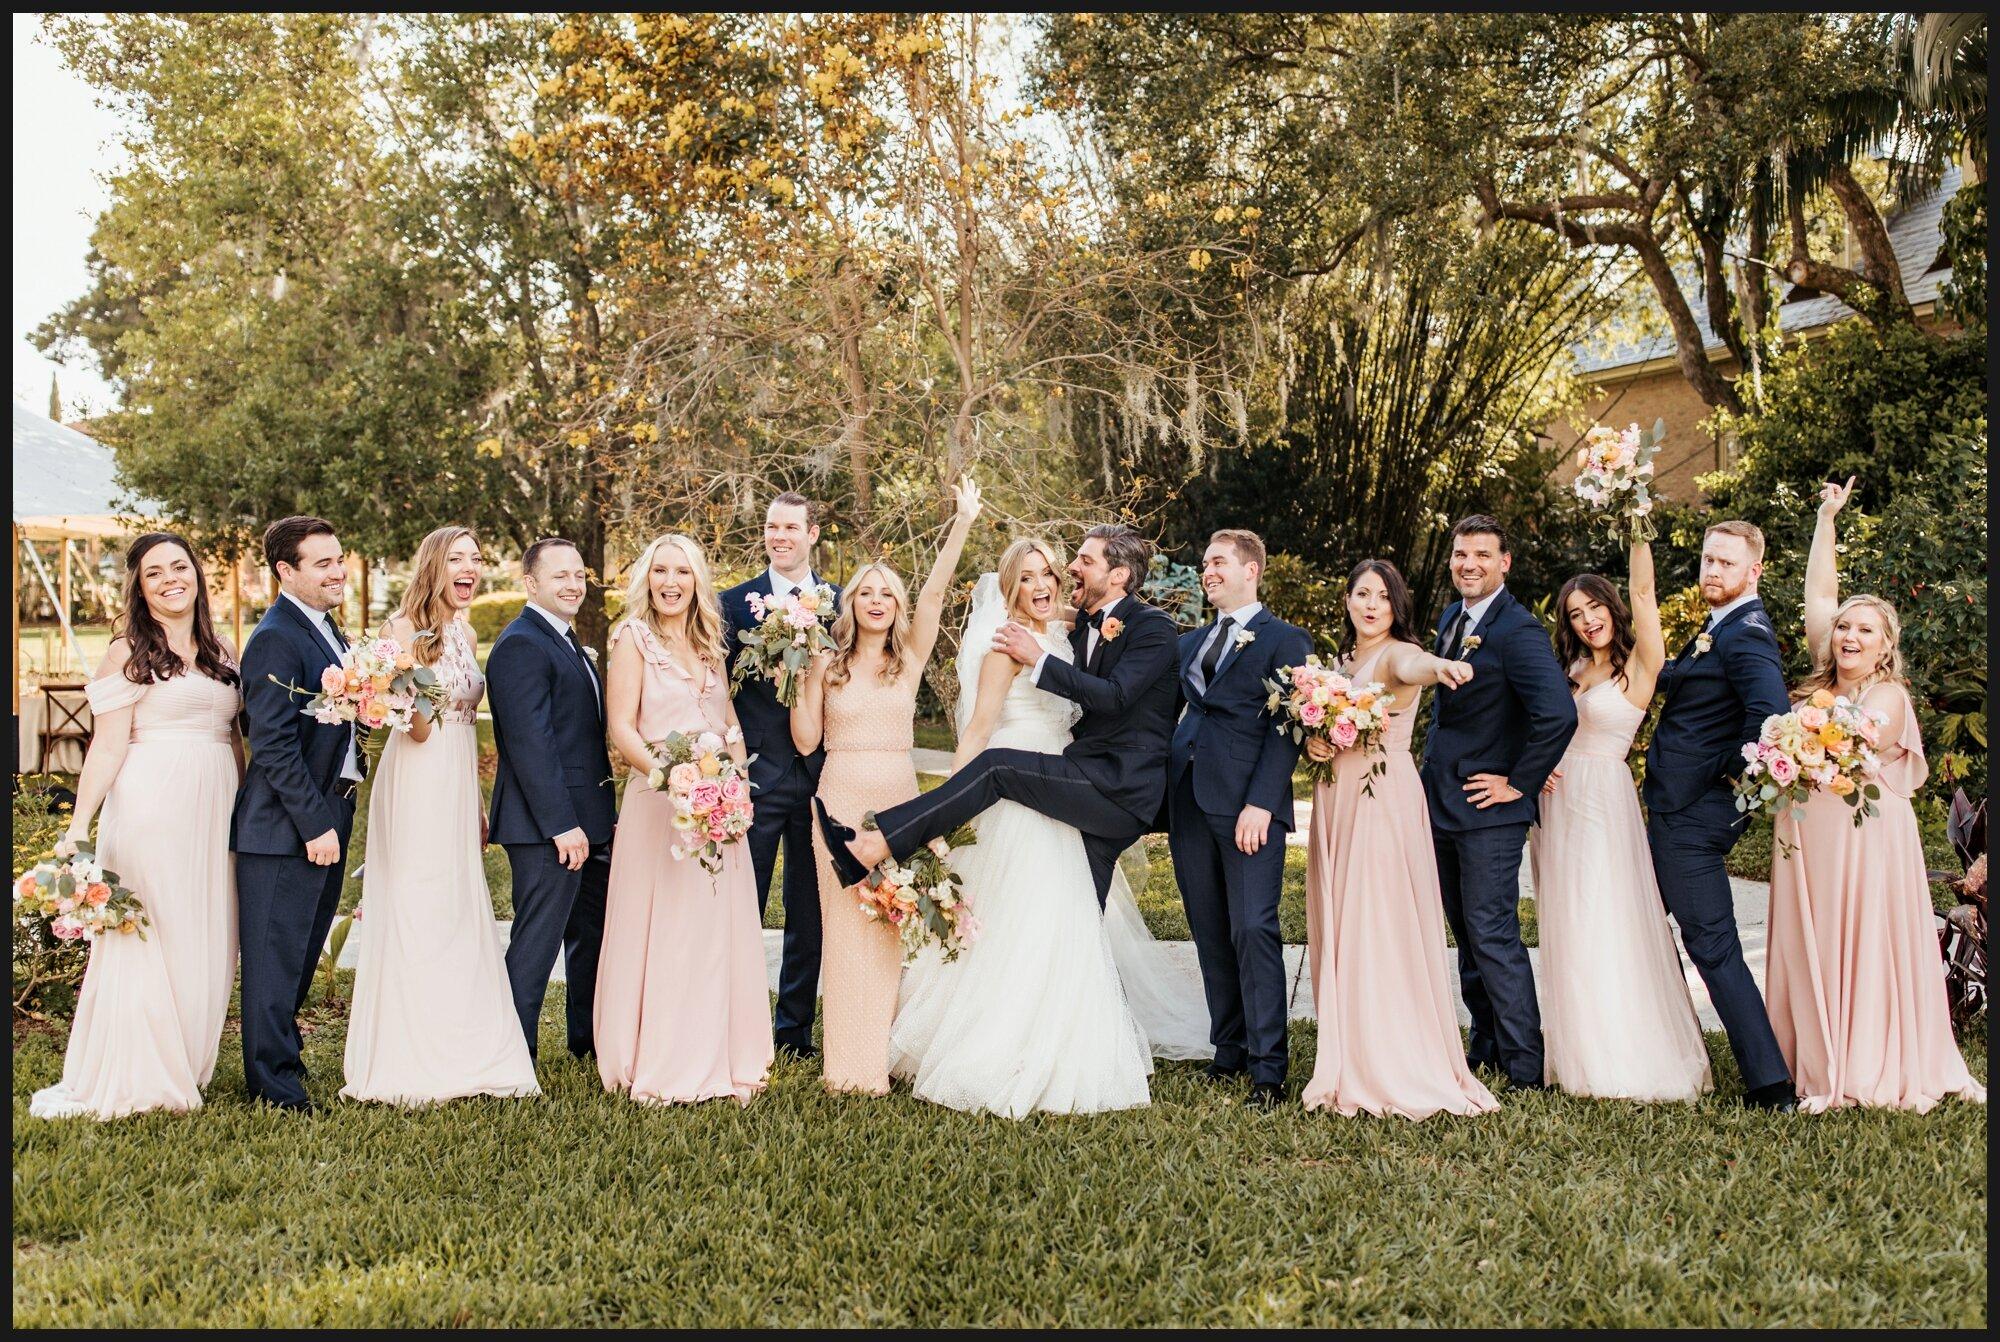 Orlando-Wedding-Photographer-destination-wedding-photographer-florida-wedding-photographer-hawaii-wedding-photographer_0757.jpg